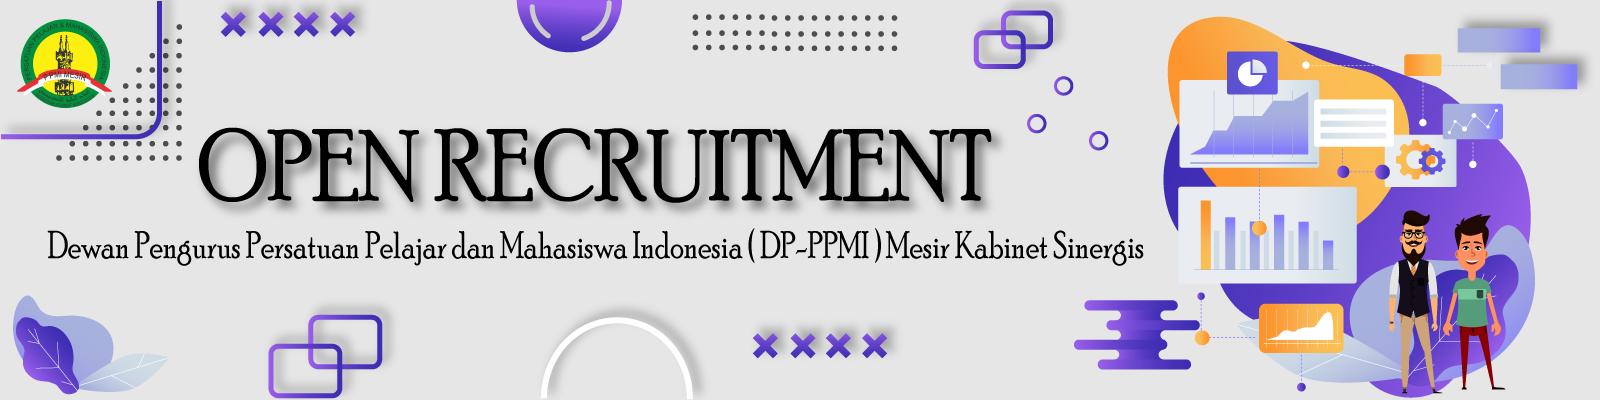 Ayo Daftar! Open Recruitment DP PPMI Mesir Kabinet Sinergis